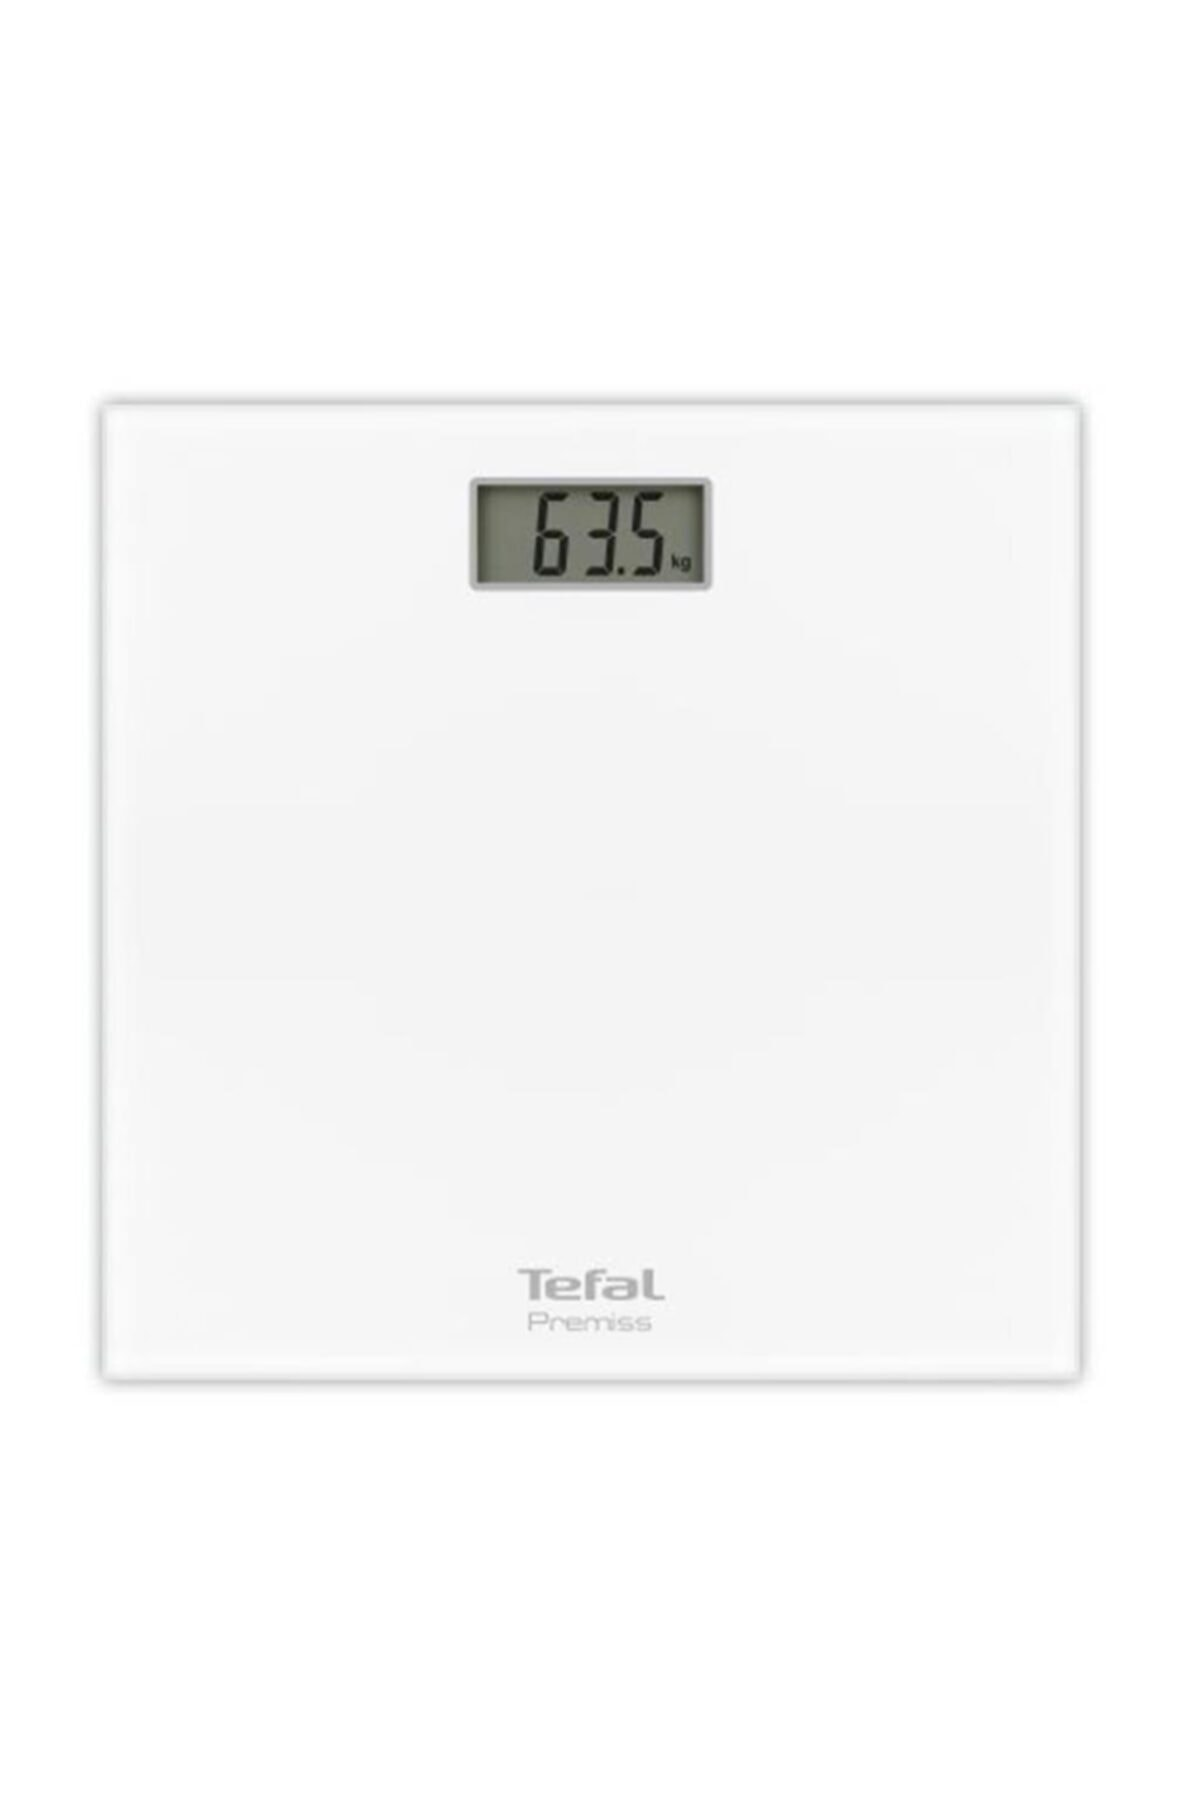 TEFAL Premiss Tartı Beyaz (2100098628) 2